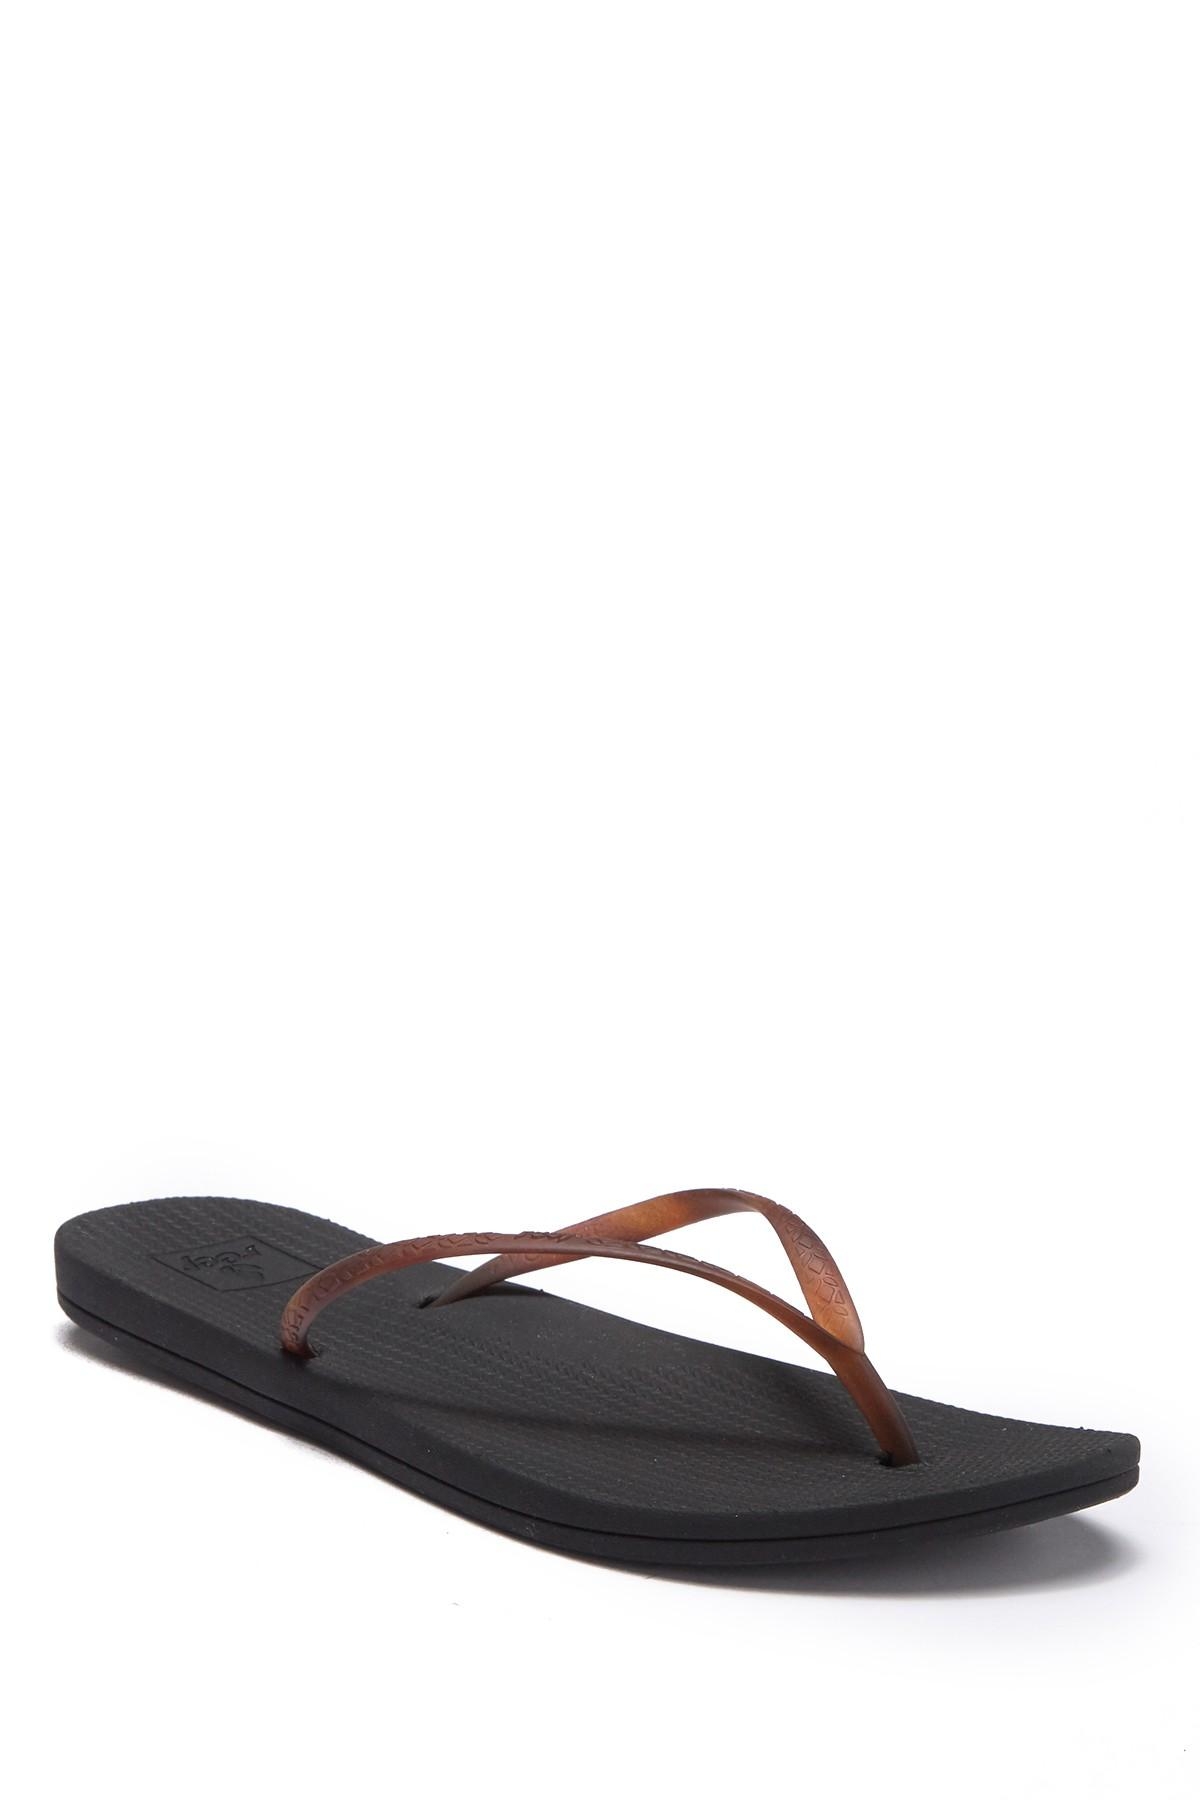 784184e3fb39 Reef. Black Escape Lux Tort Sandal (women).  29  17 From Nordstrom Rack